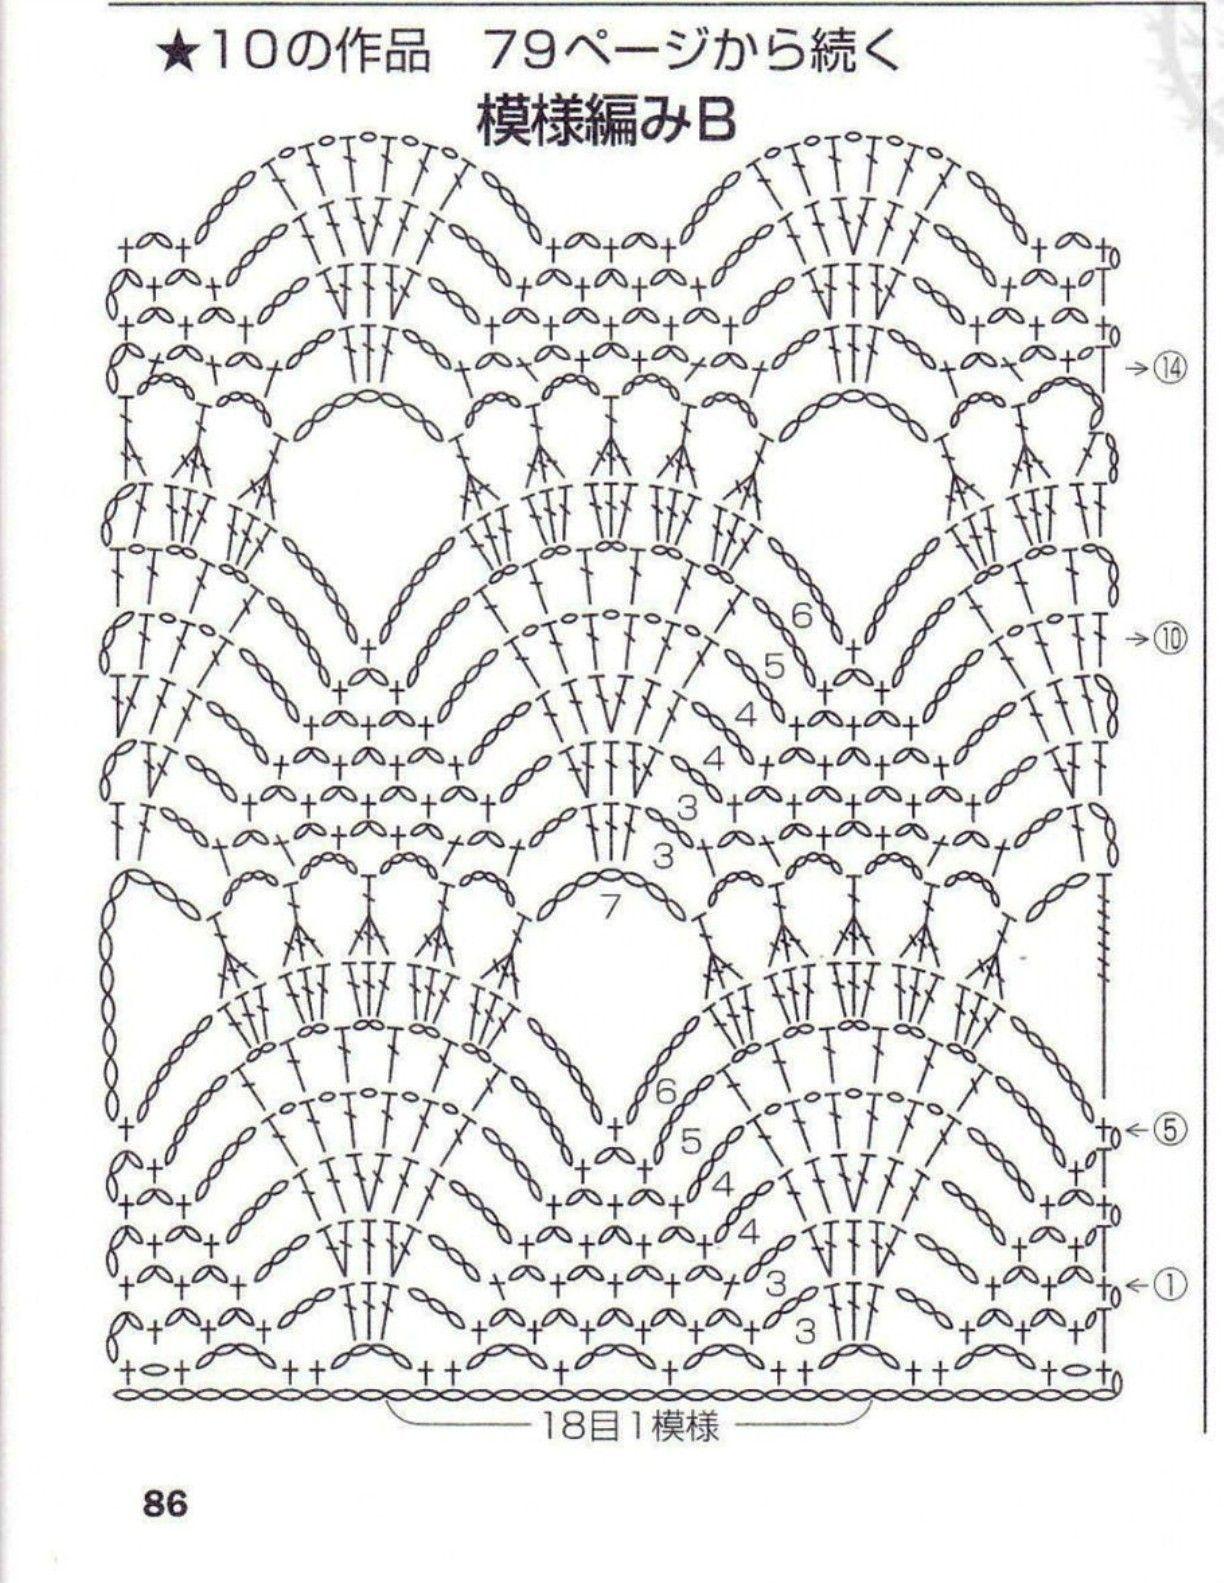 Pin de Magdalena en Druty i szydełko - Knitting needles and crochet ...